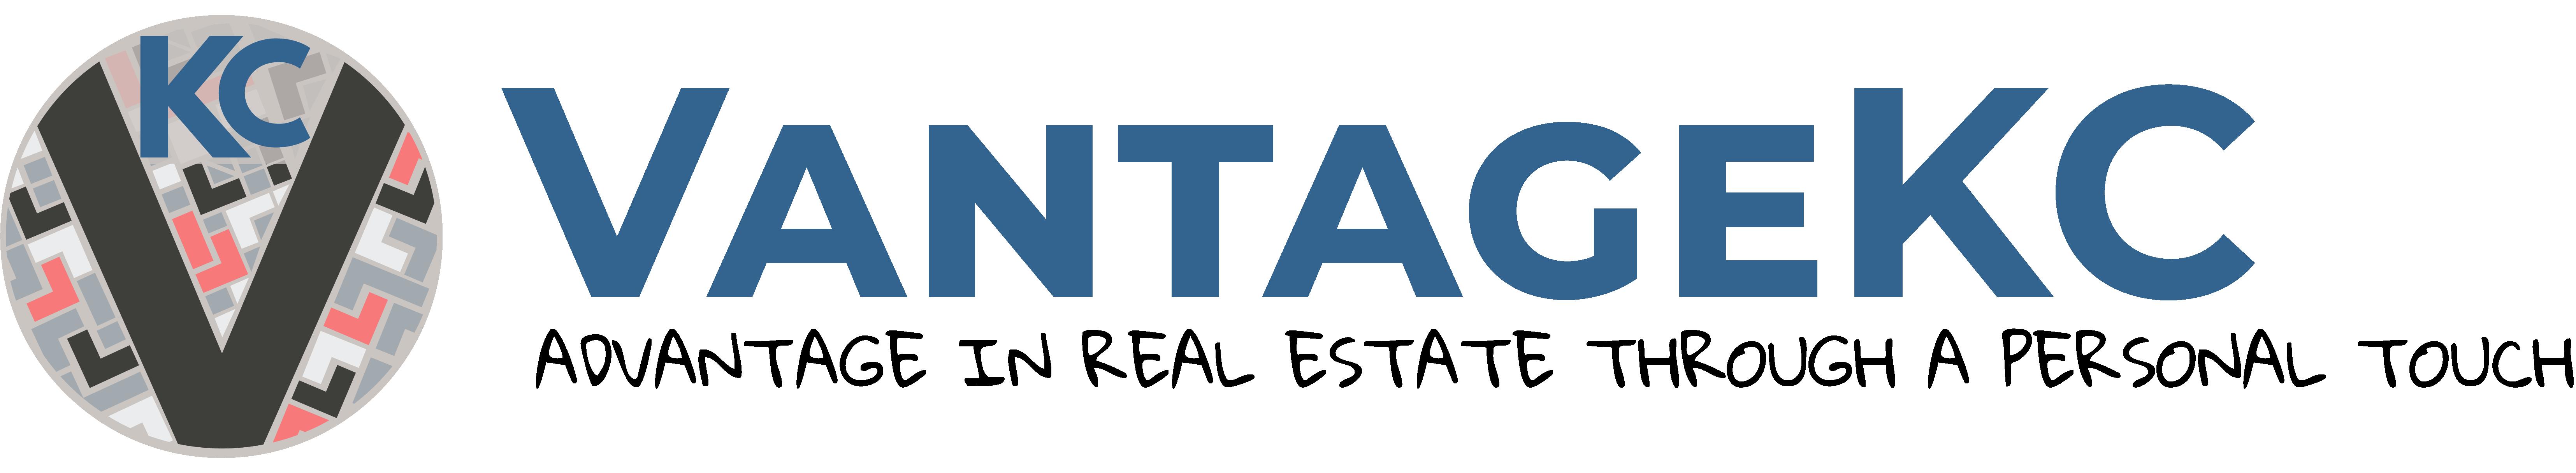 VantageKC Logo Horizontal Tagline